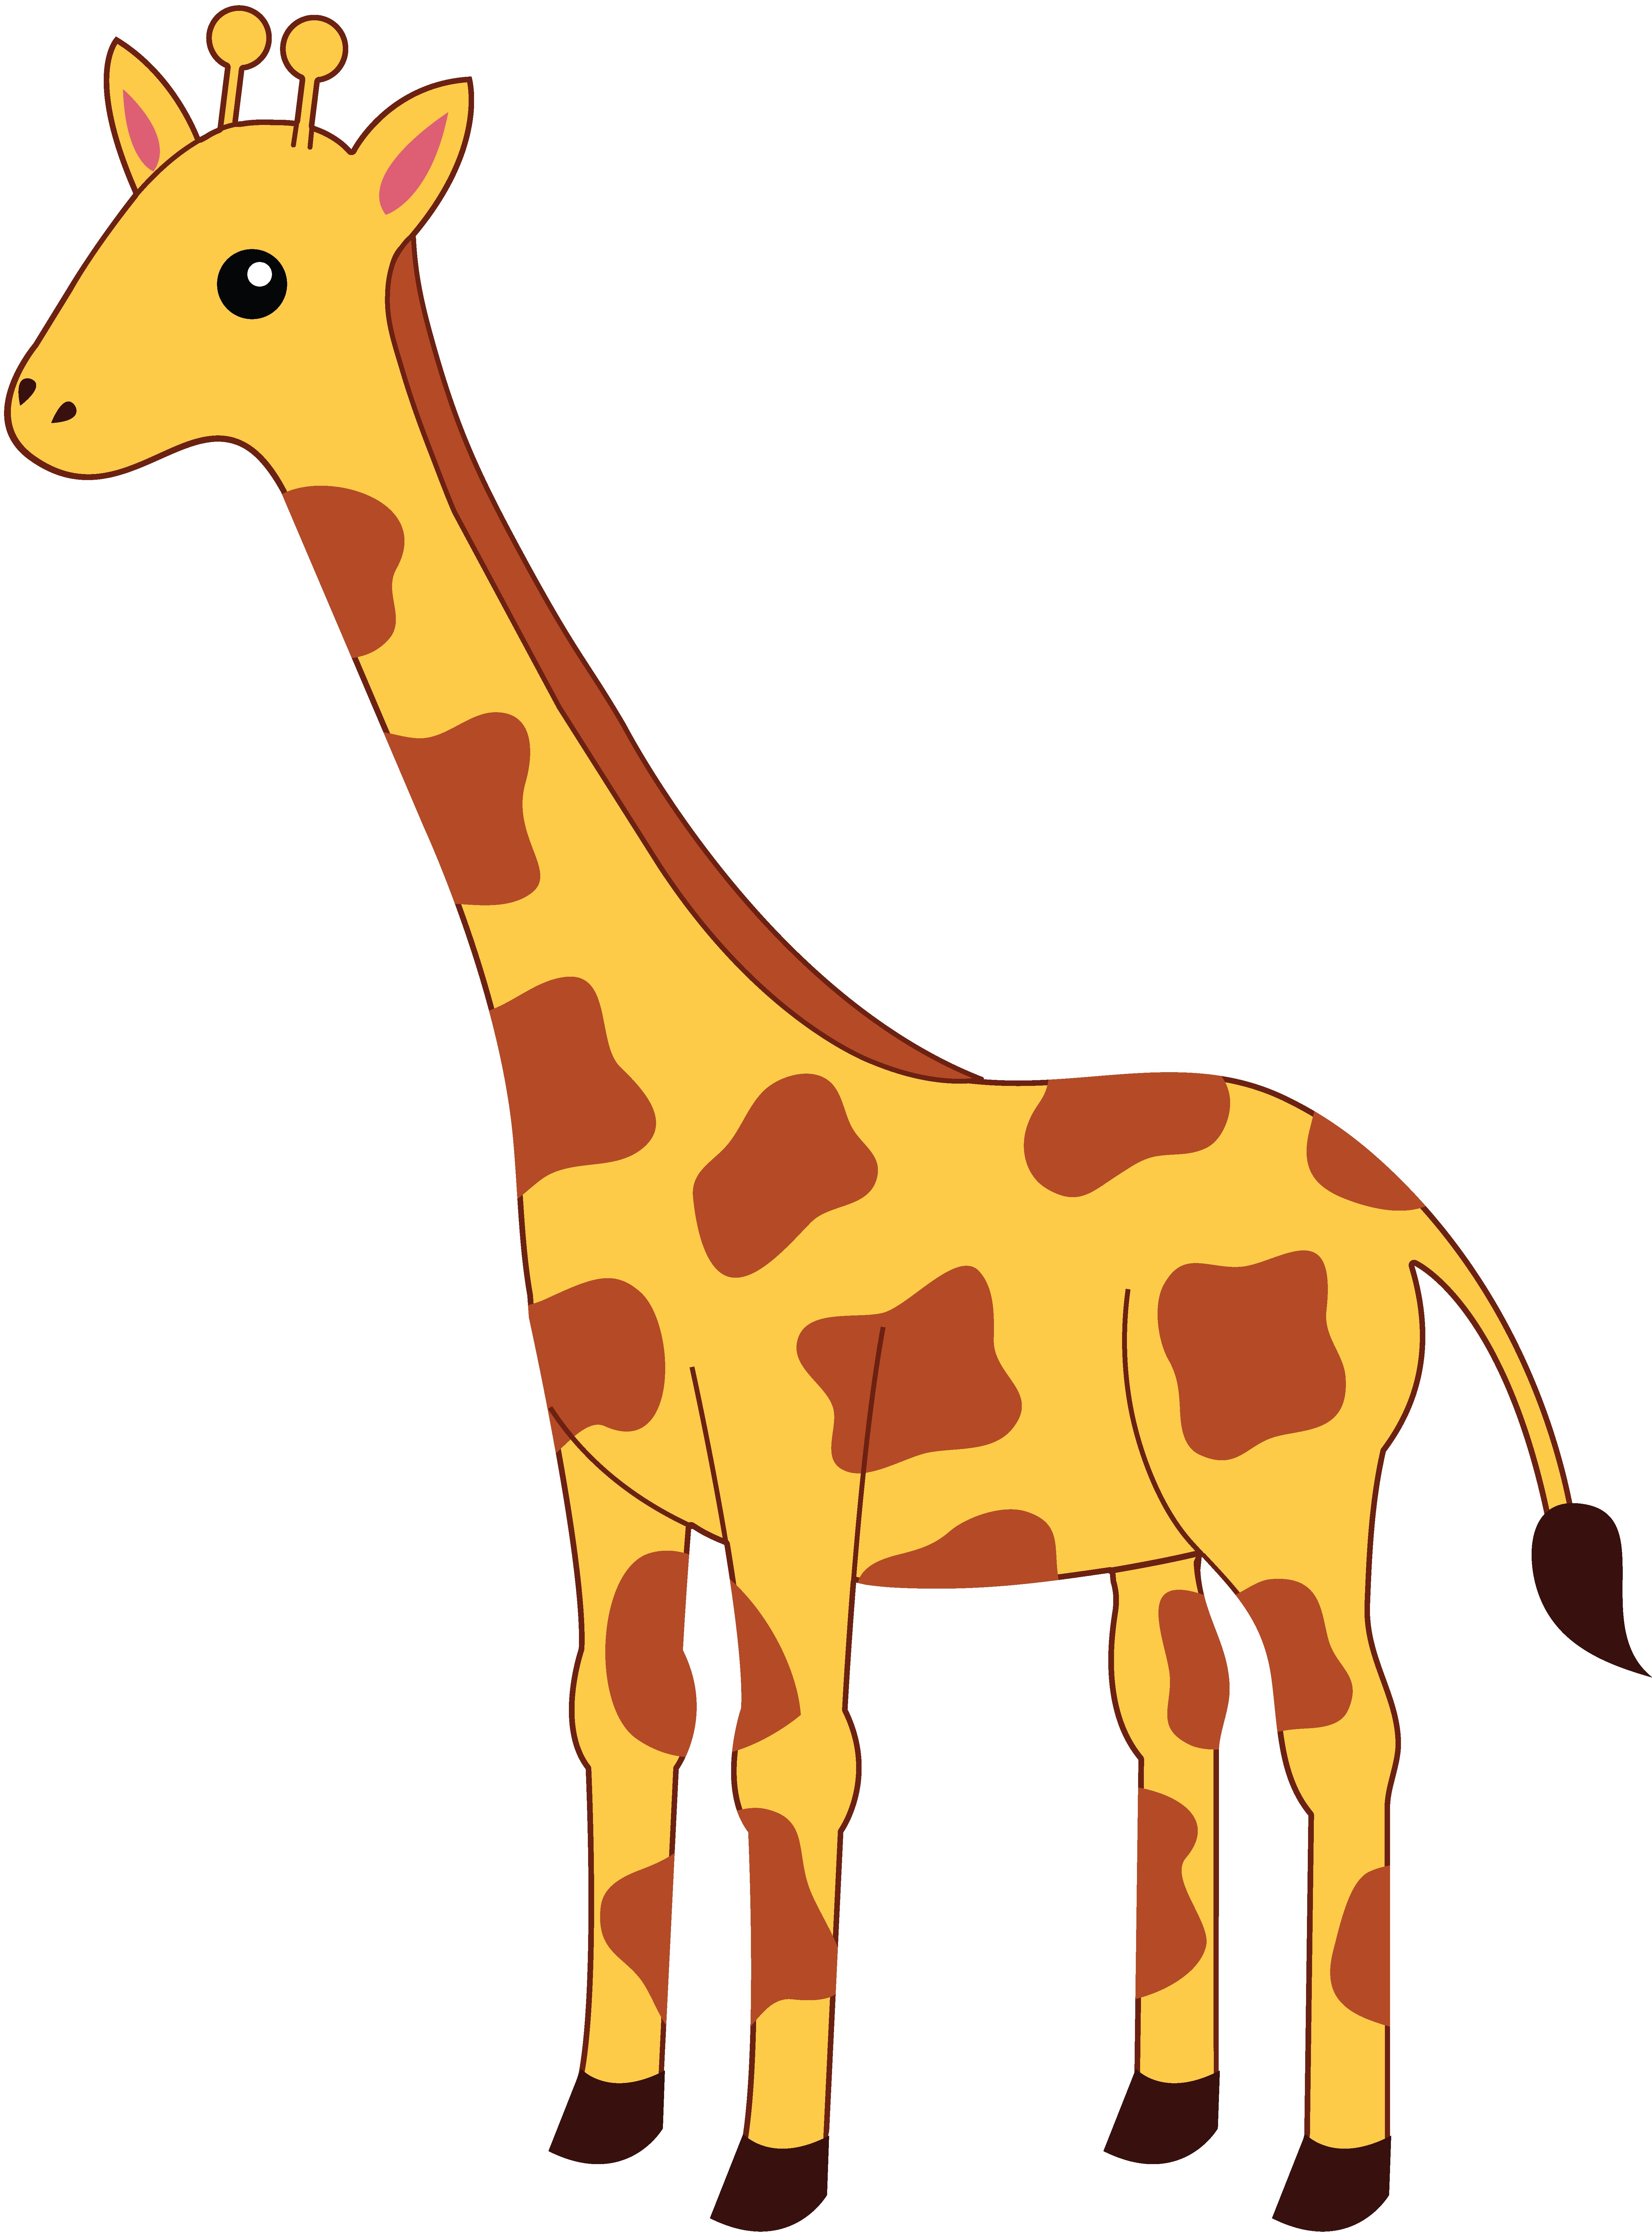 Giraffe heart clipart